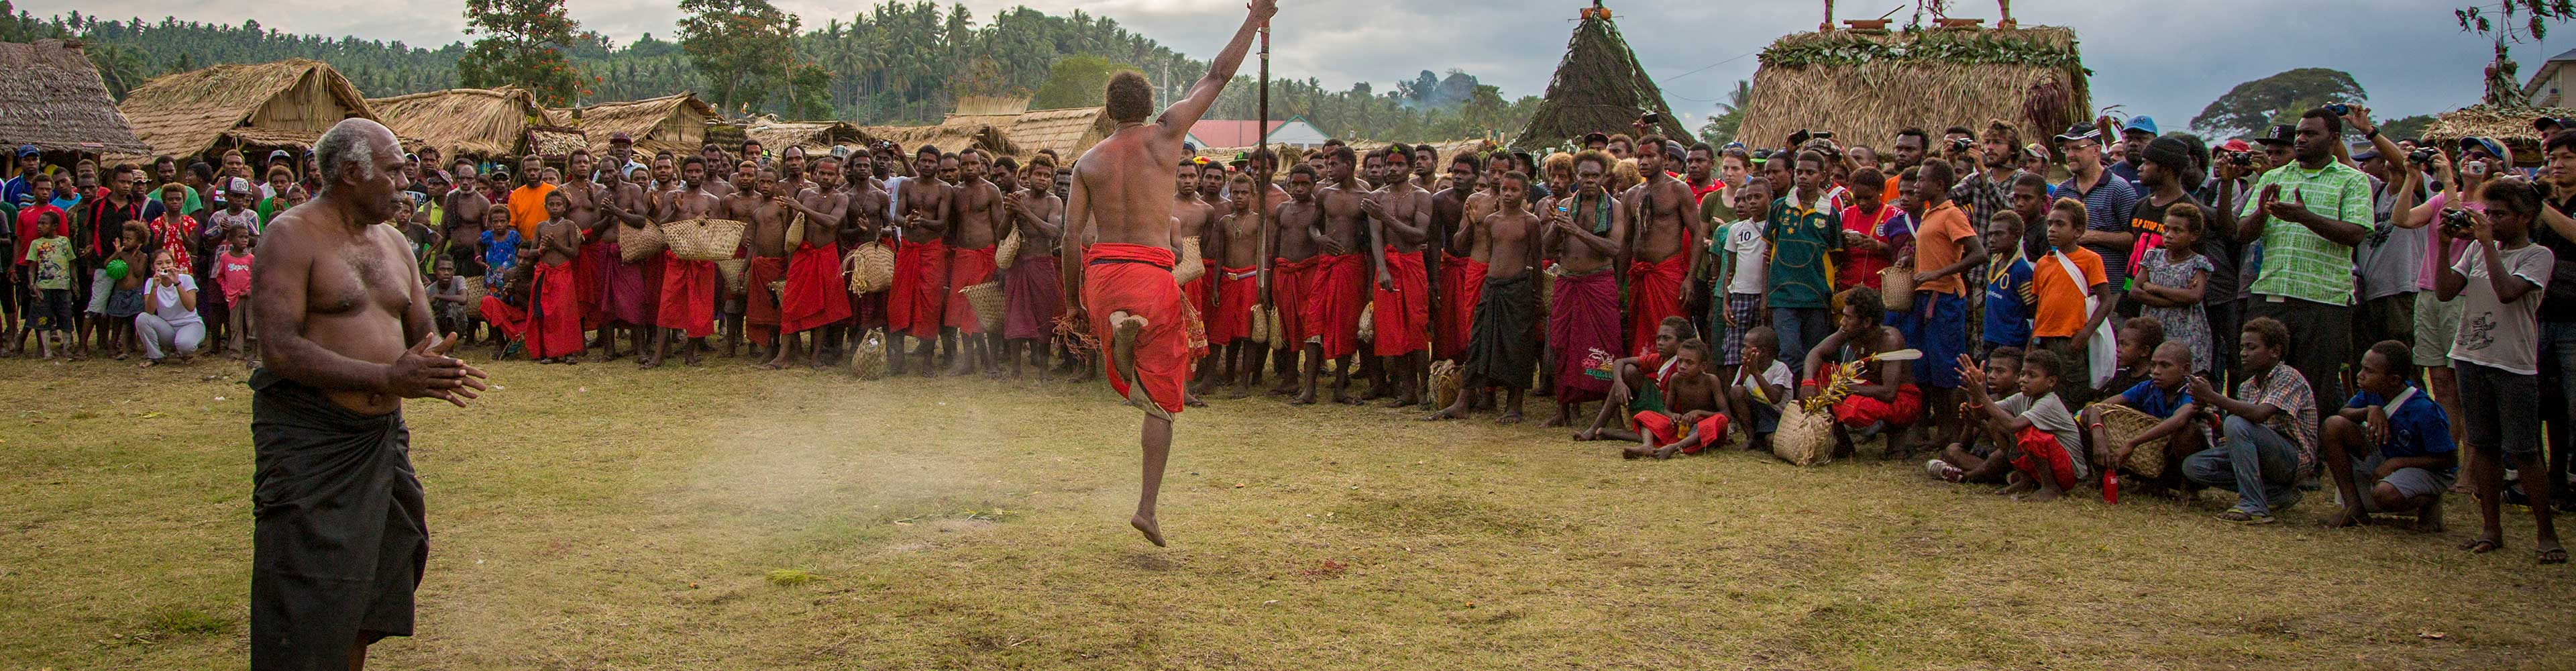 Firedance Festival, Papua New Guinea – Limited Edition